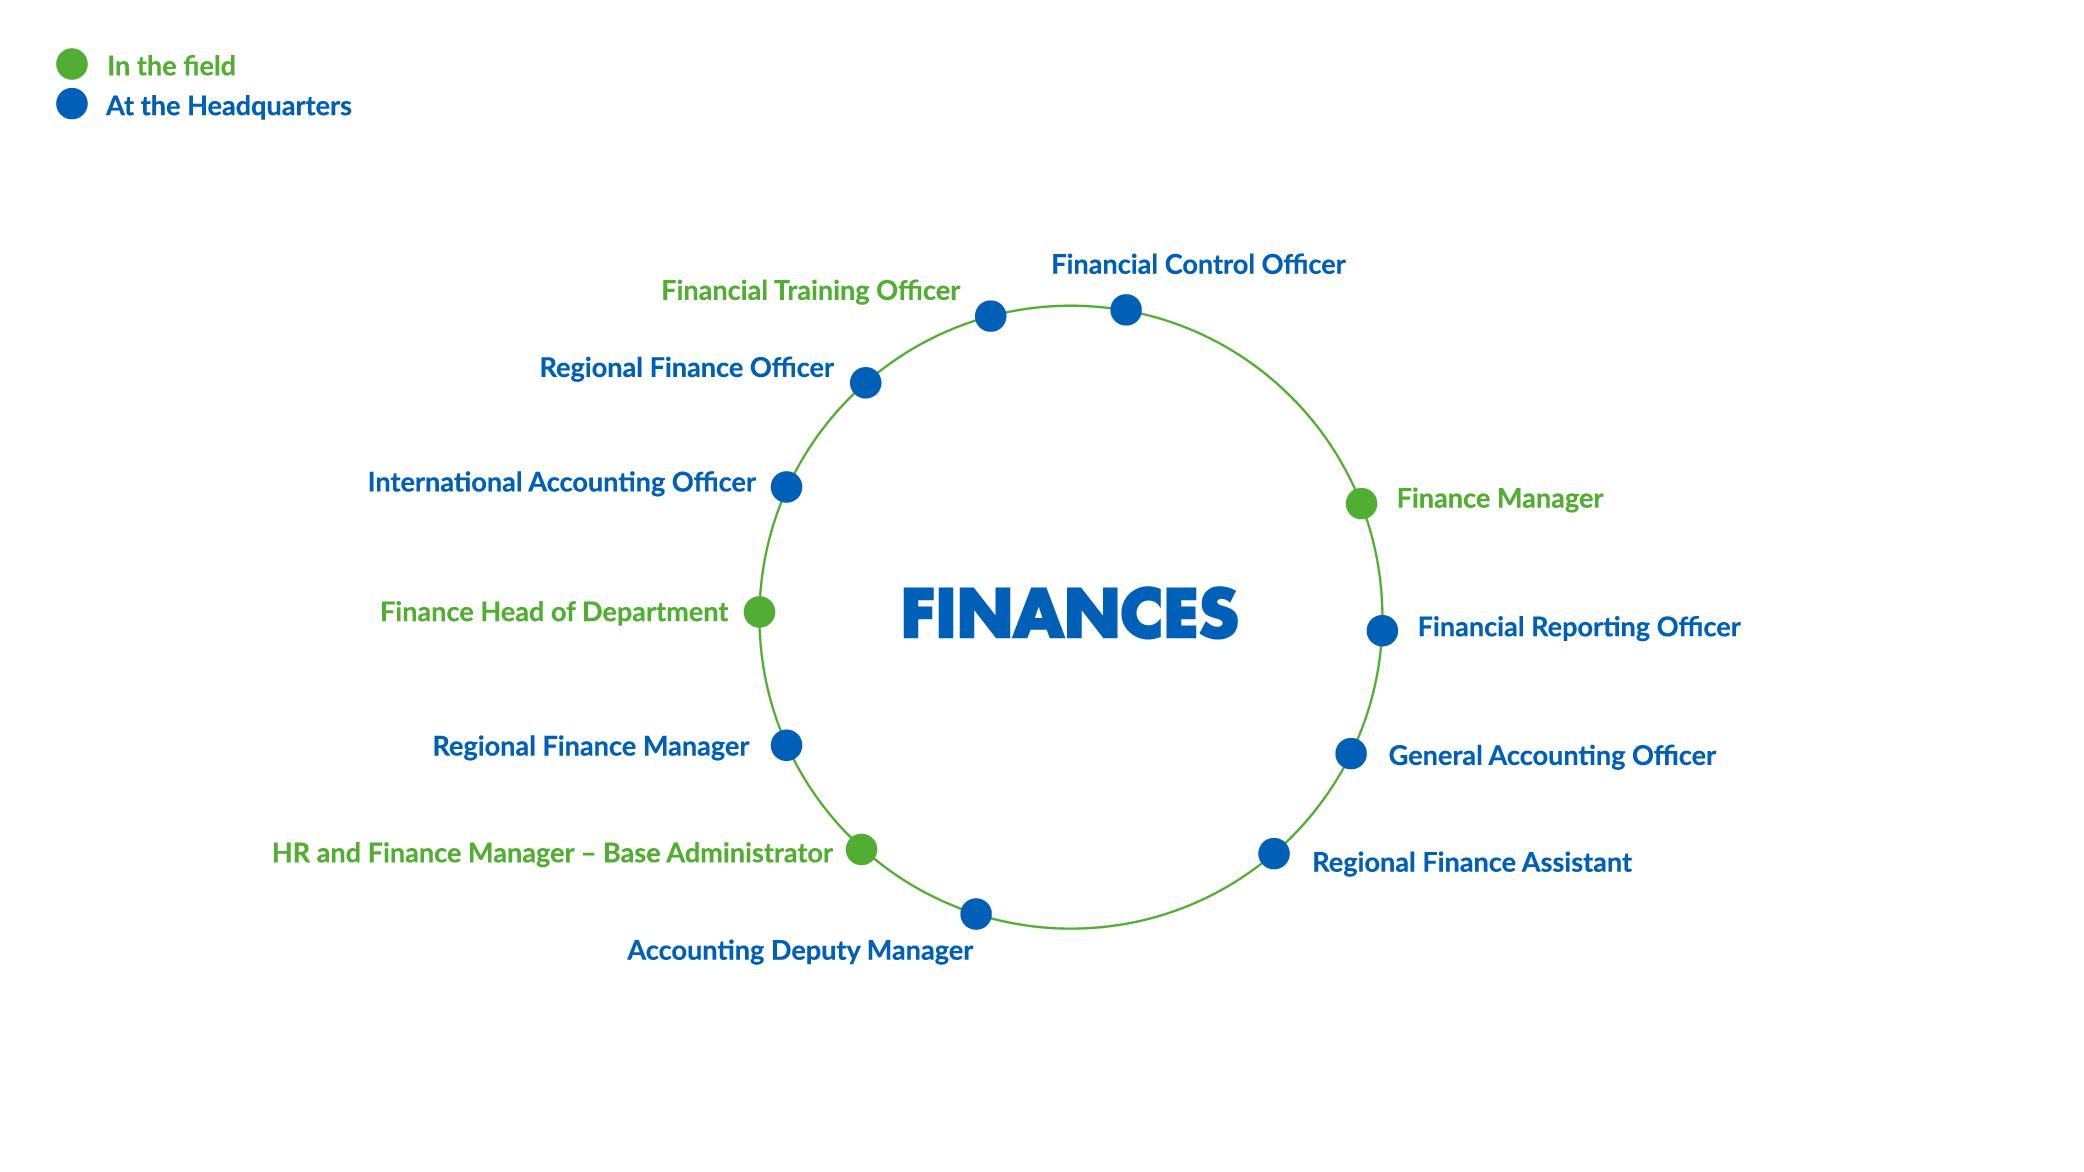 CARTOEN_DAF Finances